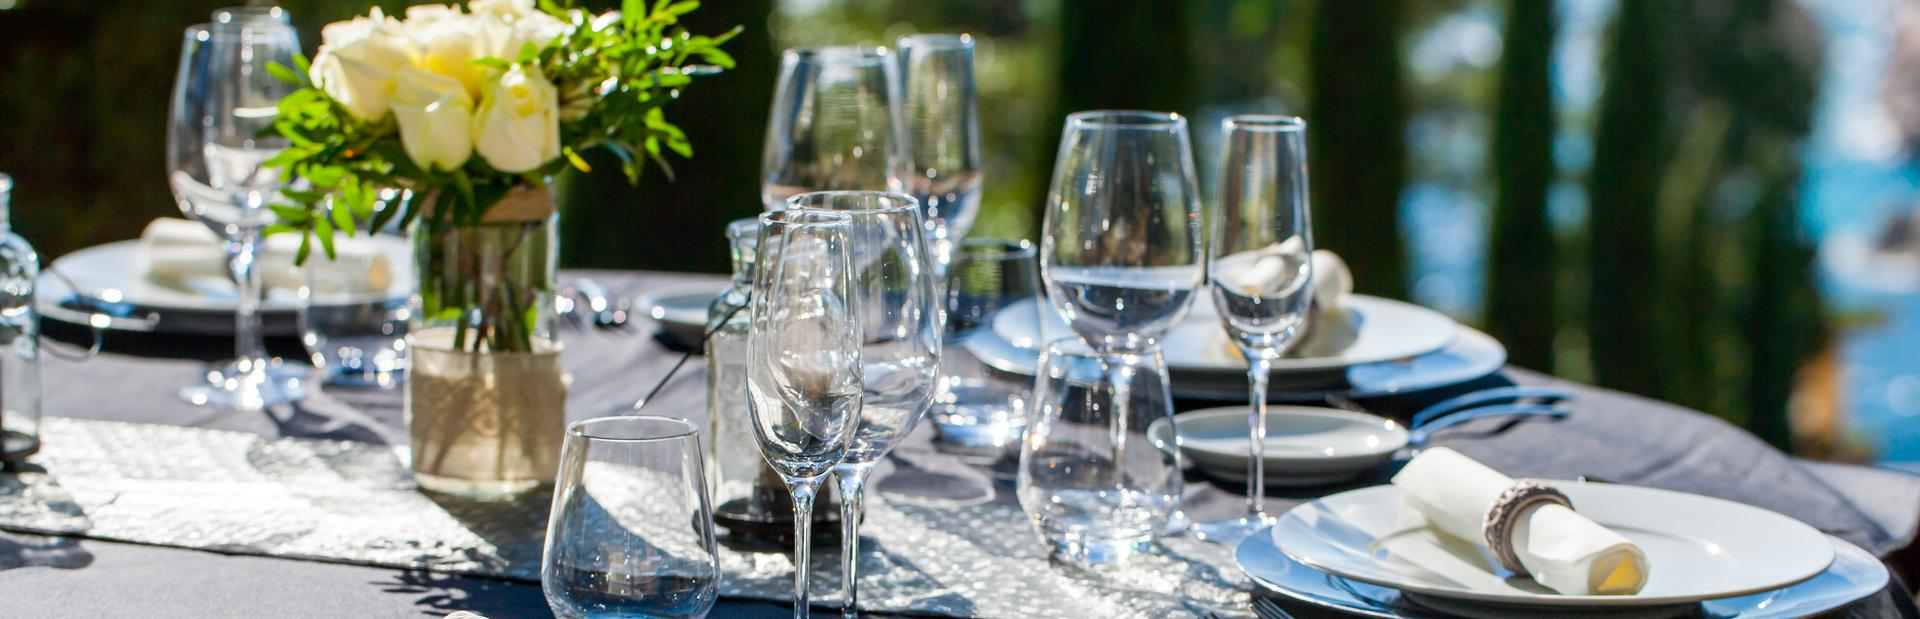 Haute Cuisine: The French Riviera's best restaurants